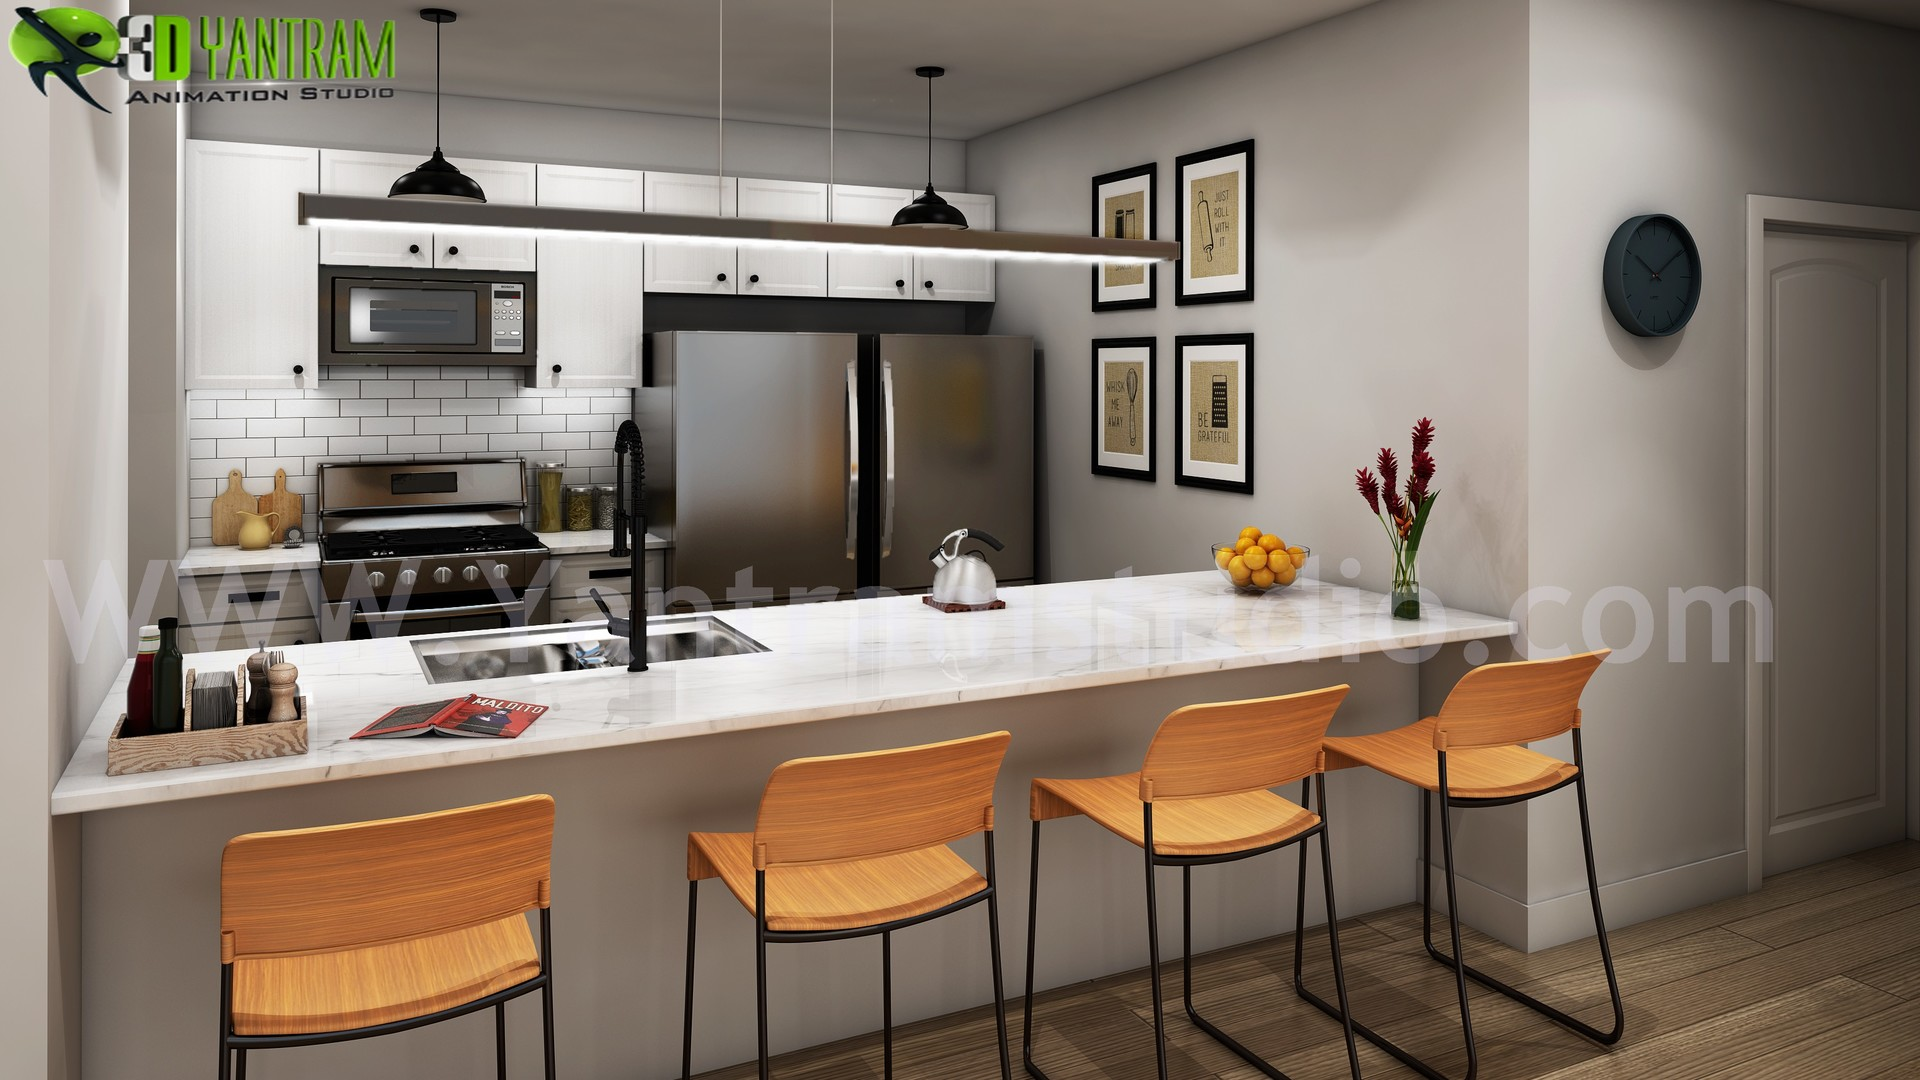 ArtStation   Modern Small Kitchen Design Ideas by Yantram 20d ...